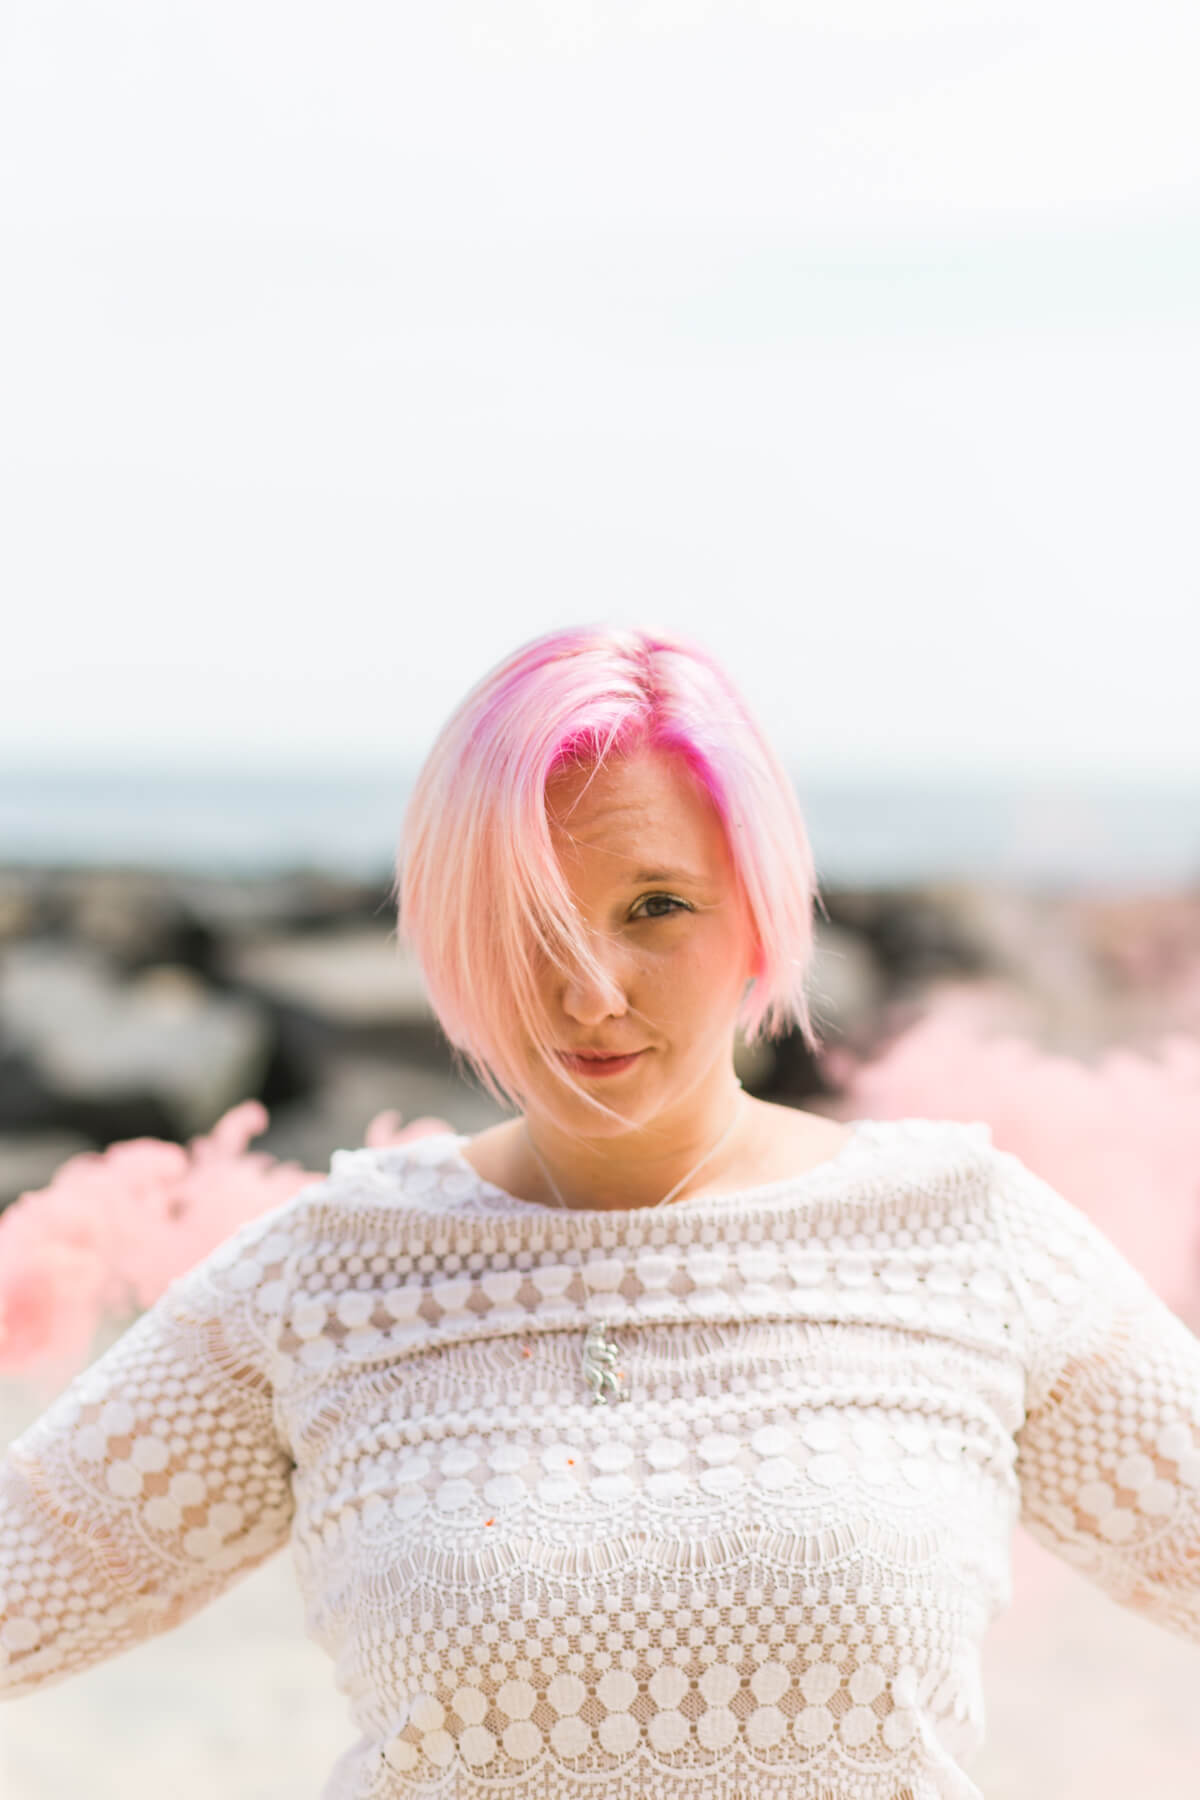 Free videos of women fucking aminals